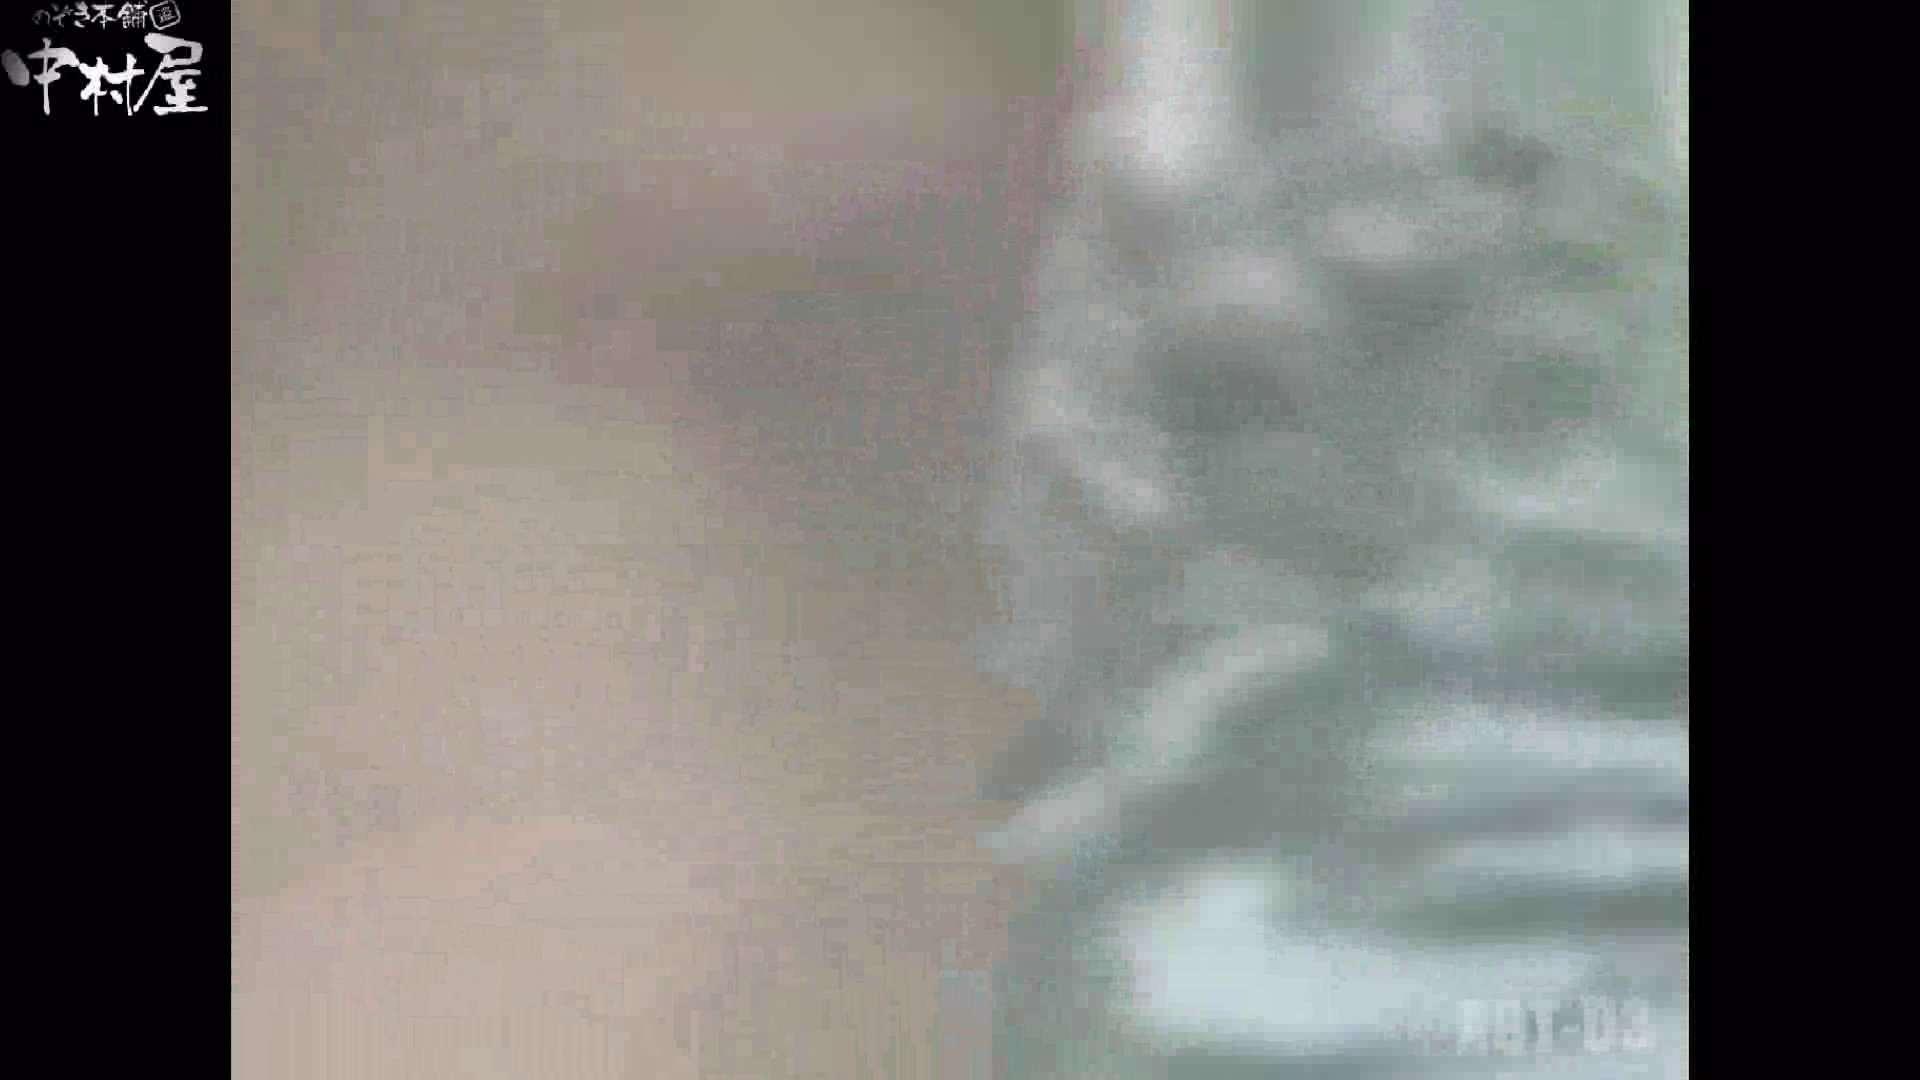 Aquaな露天風呂Vol.867潜入盗撮露天風呂参判湯 其の一 潜入突撃 エロ画像 99pic 27